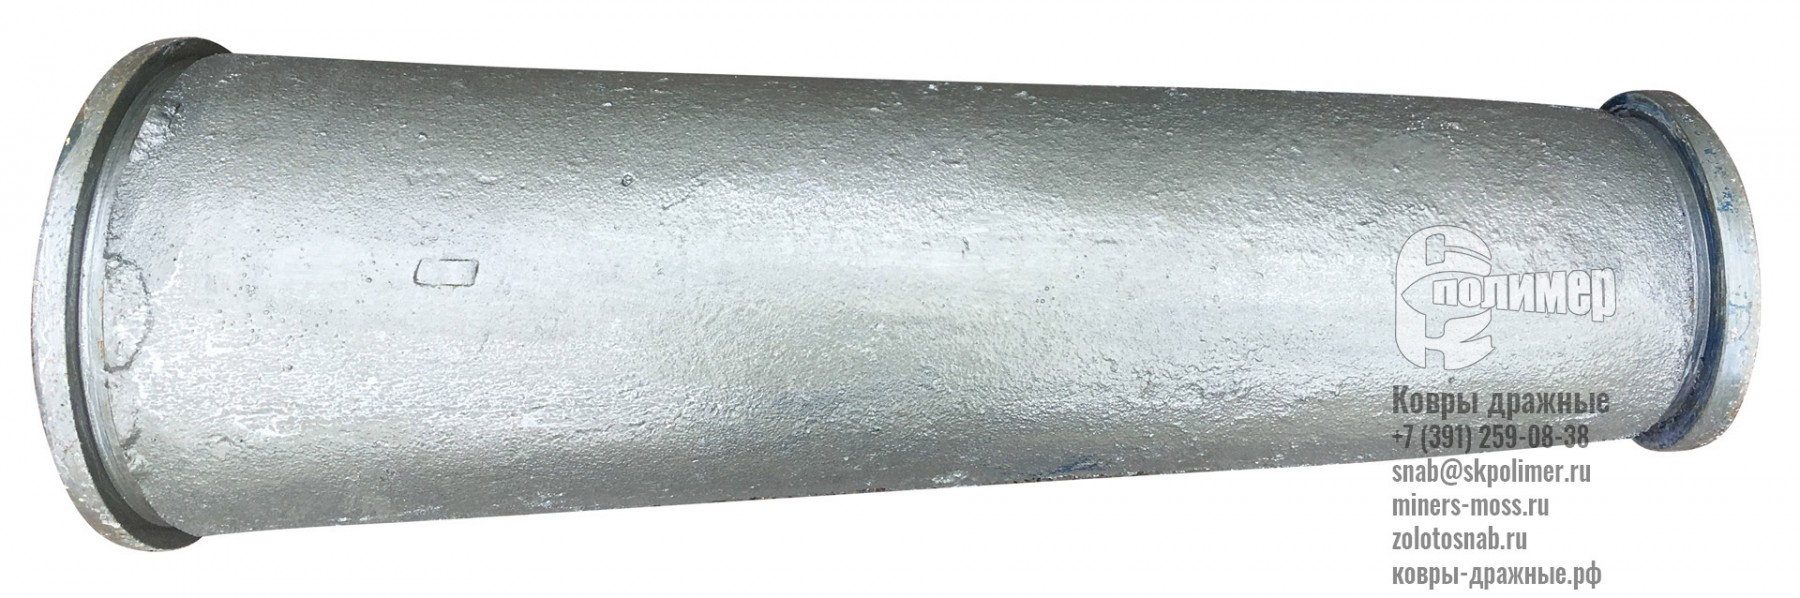 раструб (диффузор) гидроэлеватора